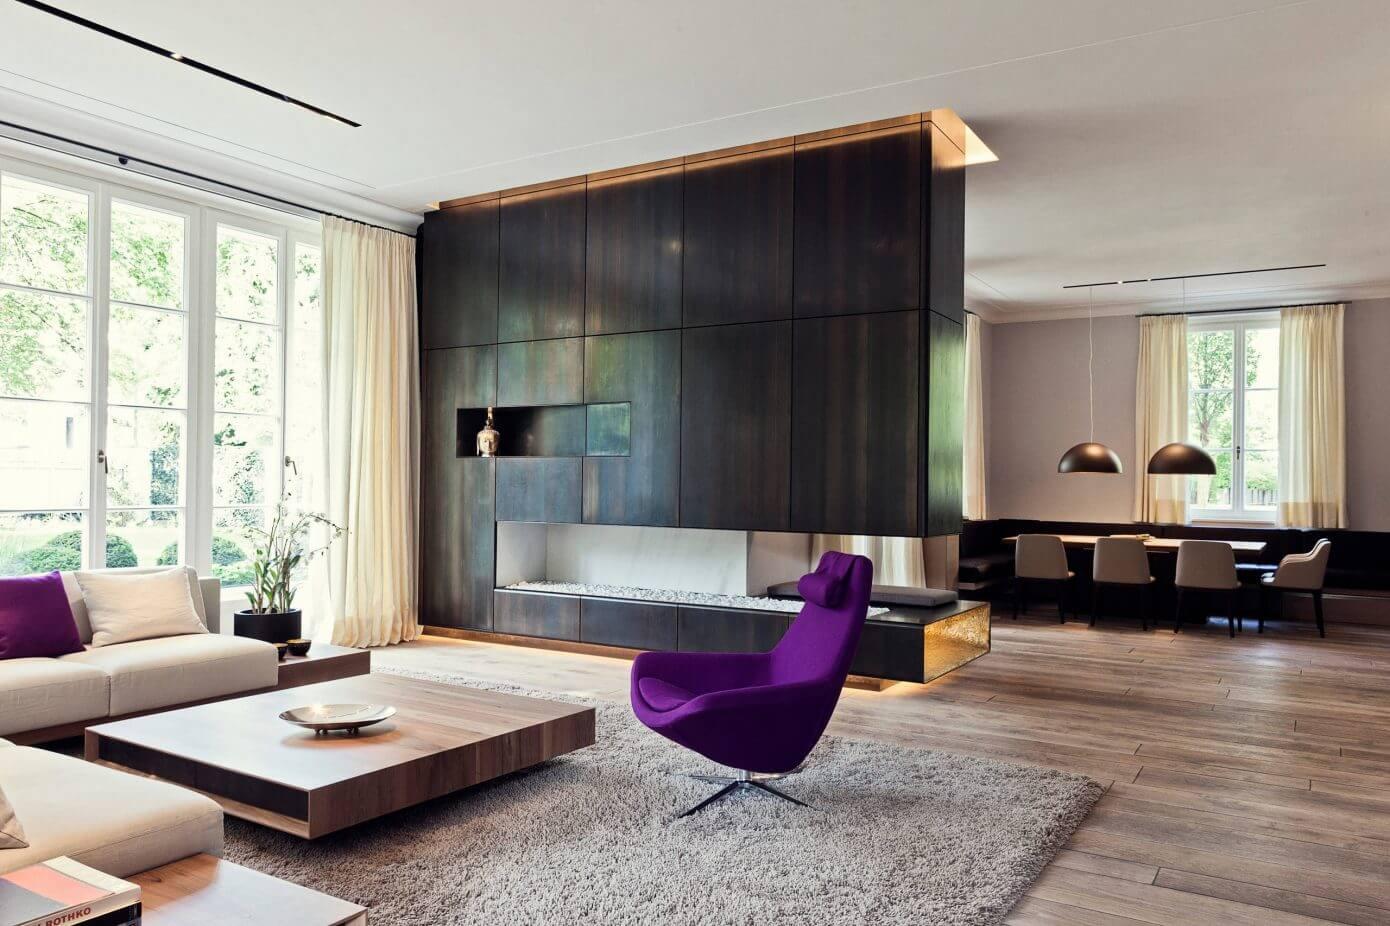 villa in munich by michale neumayr design homeadore. Black Bedroom Furniture Sets. Home Design Ideas